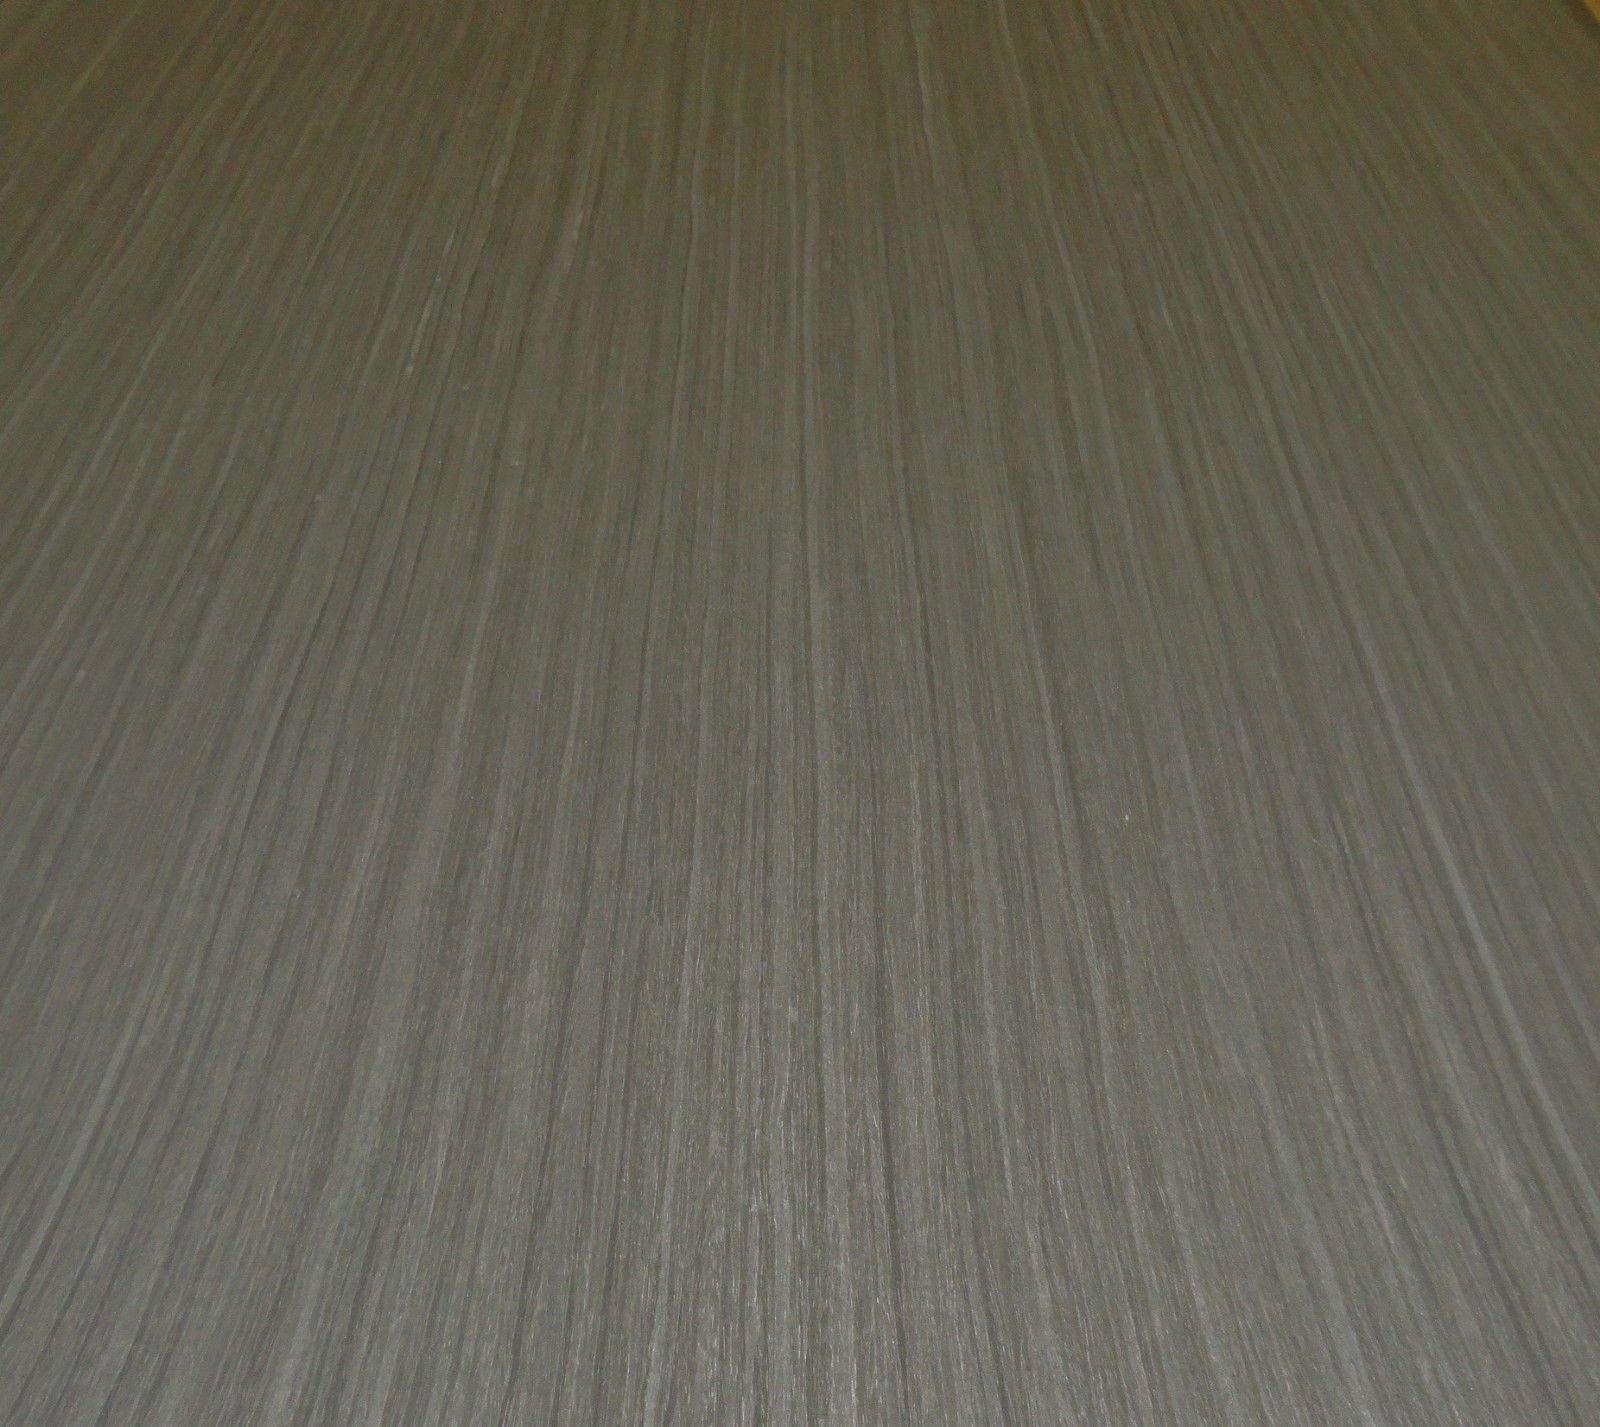 Ebony Gunmetal Gray composite wood veneer 24'' x 96'' with PSA peel stick adhesive